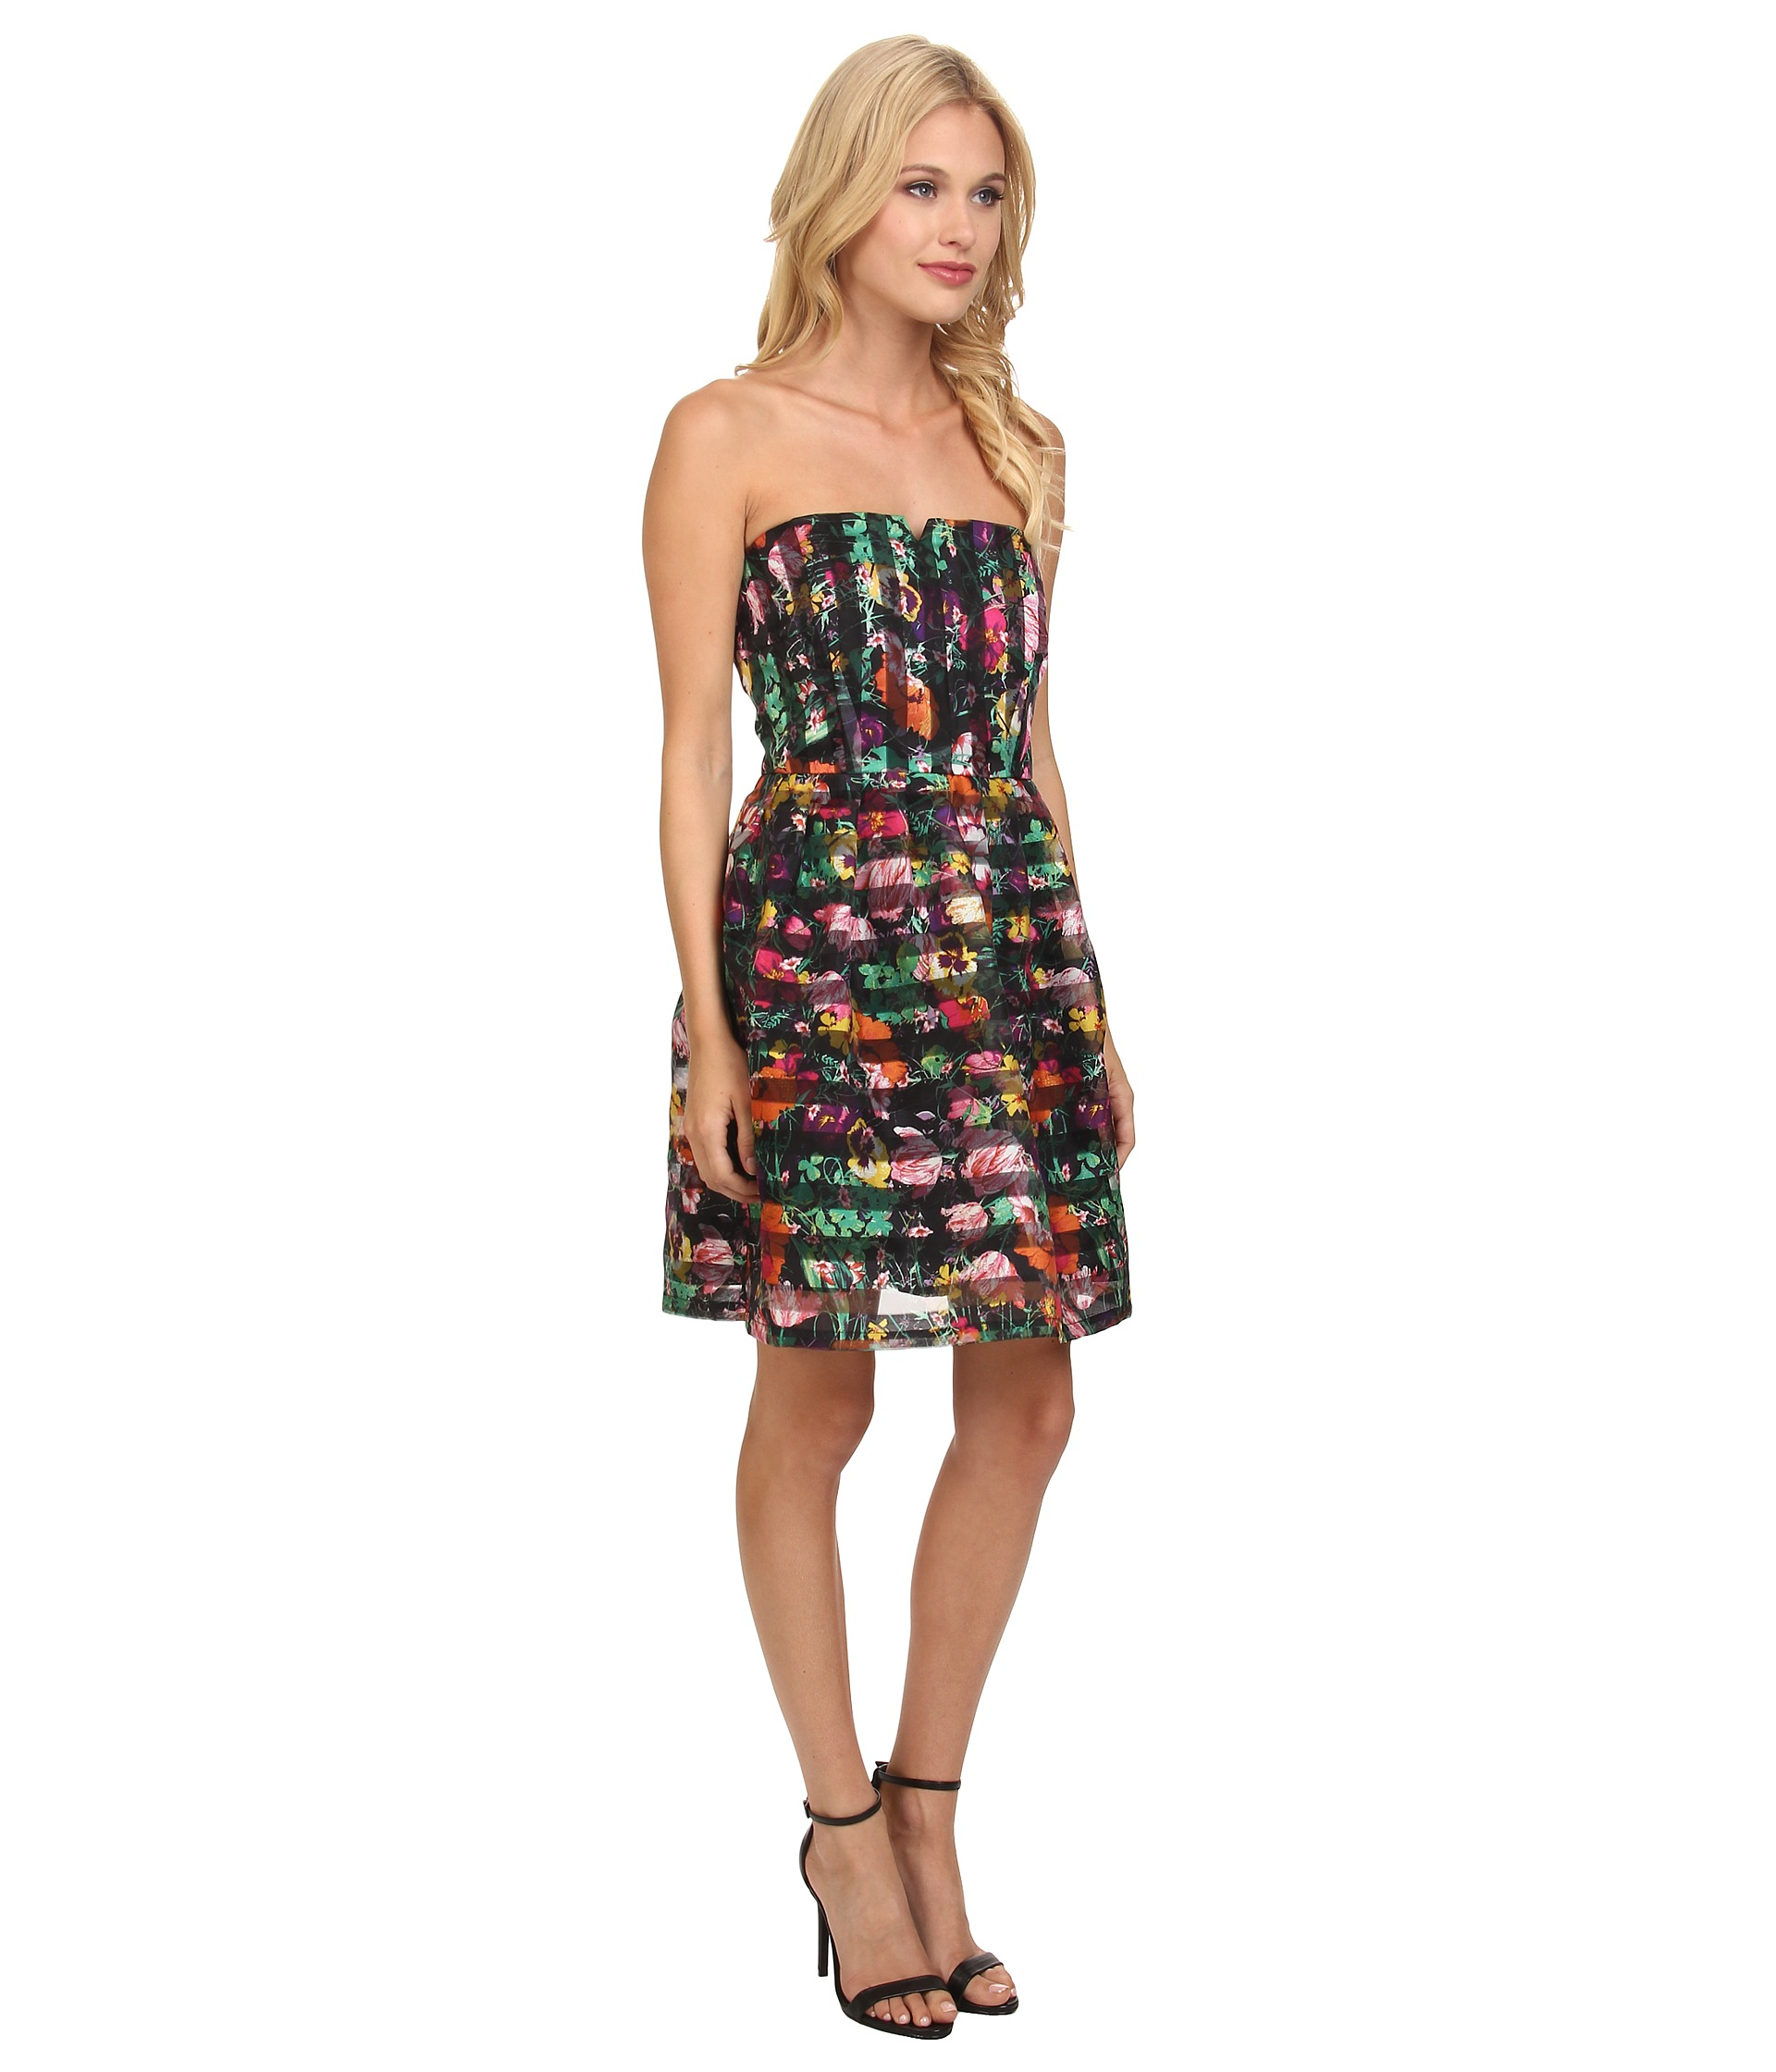 Zappos Graduation Dresses Homecoming Prom Dresses